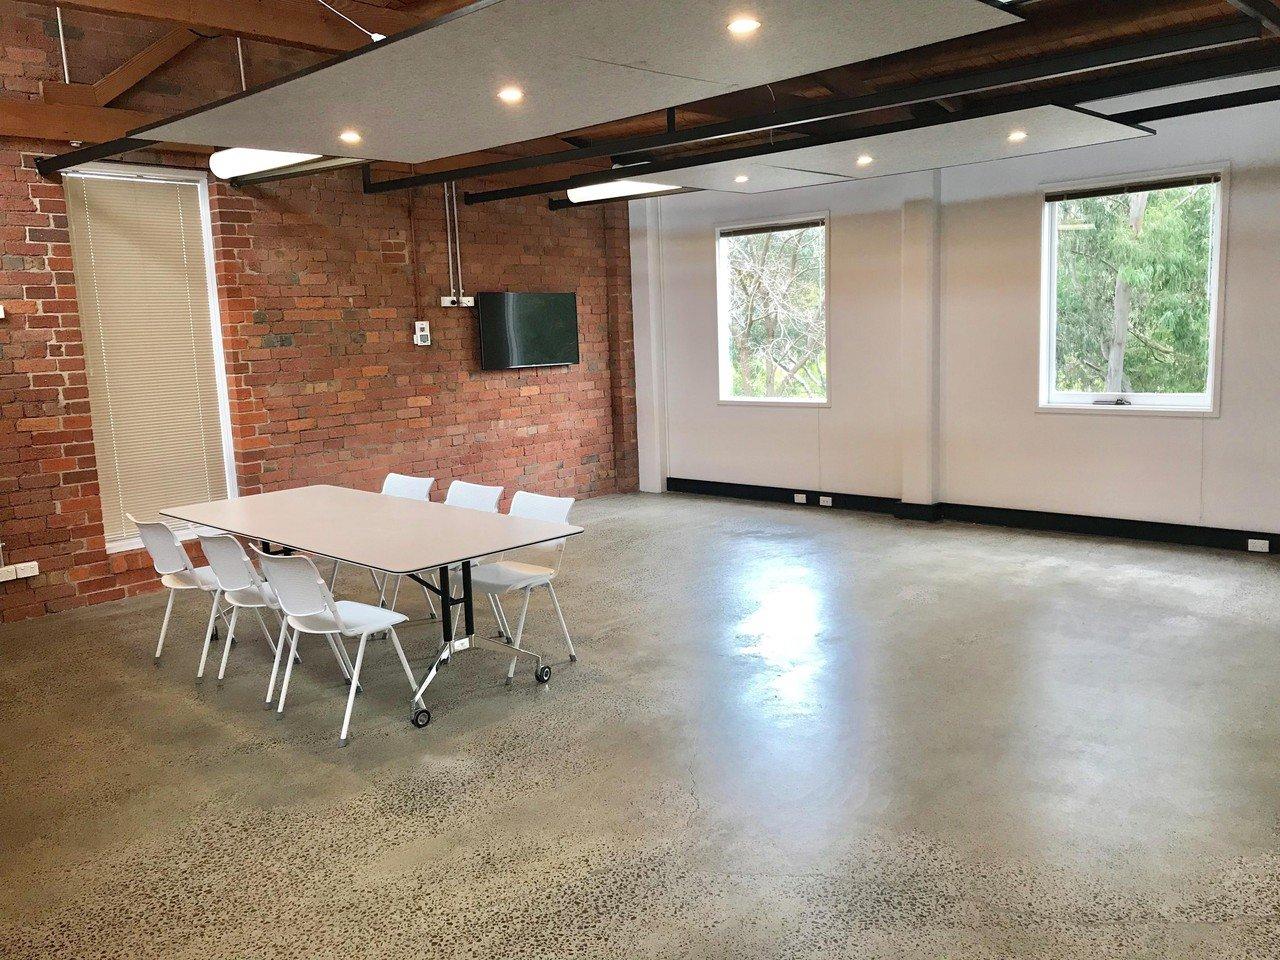 Melbourne workshop spaces Besonders Higher Spaces - Rooms 2 and 3 image 4